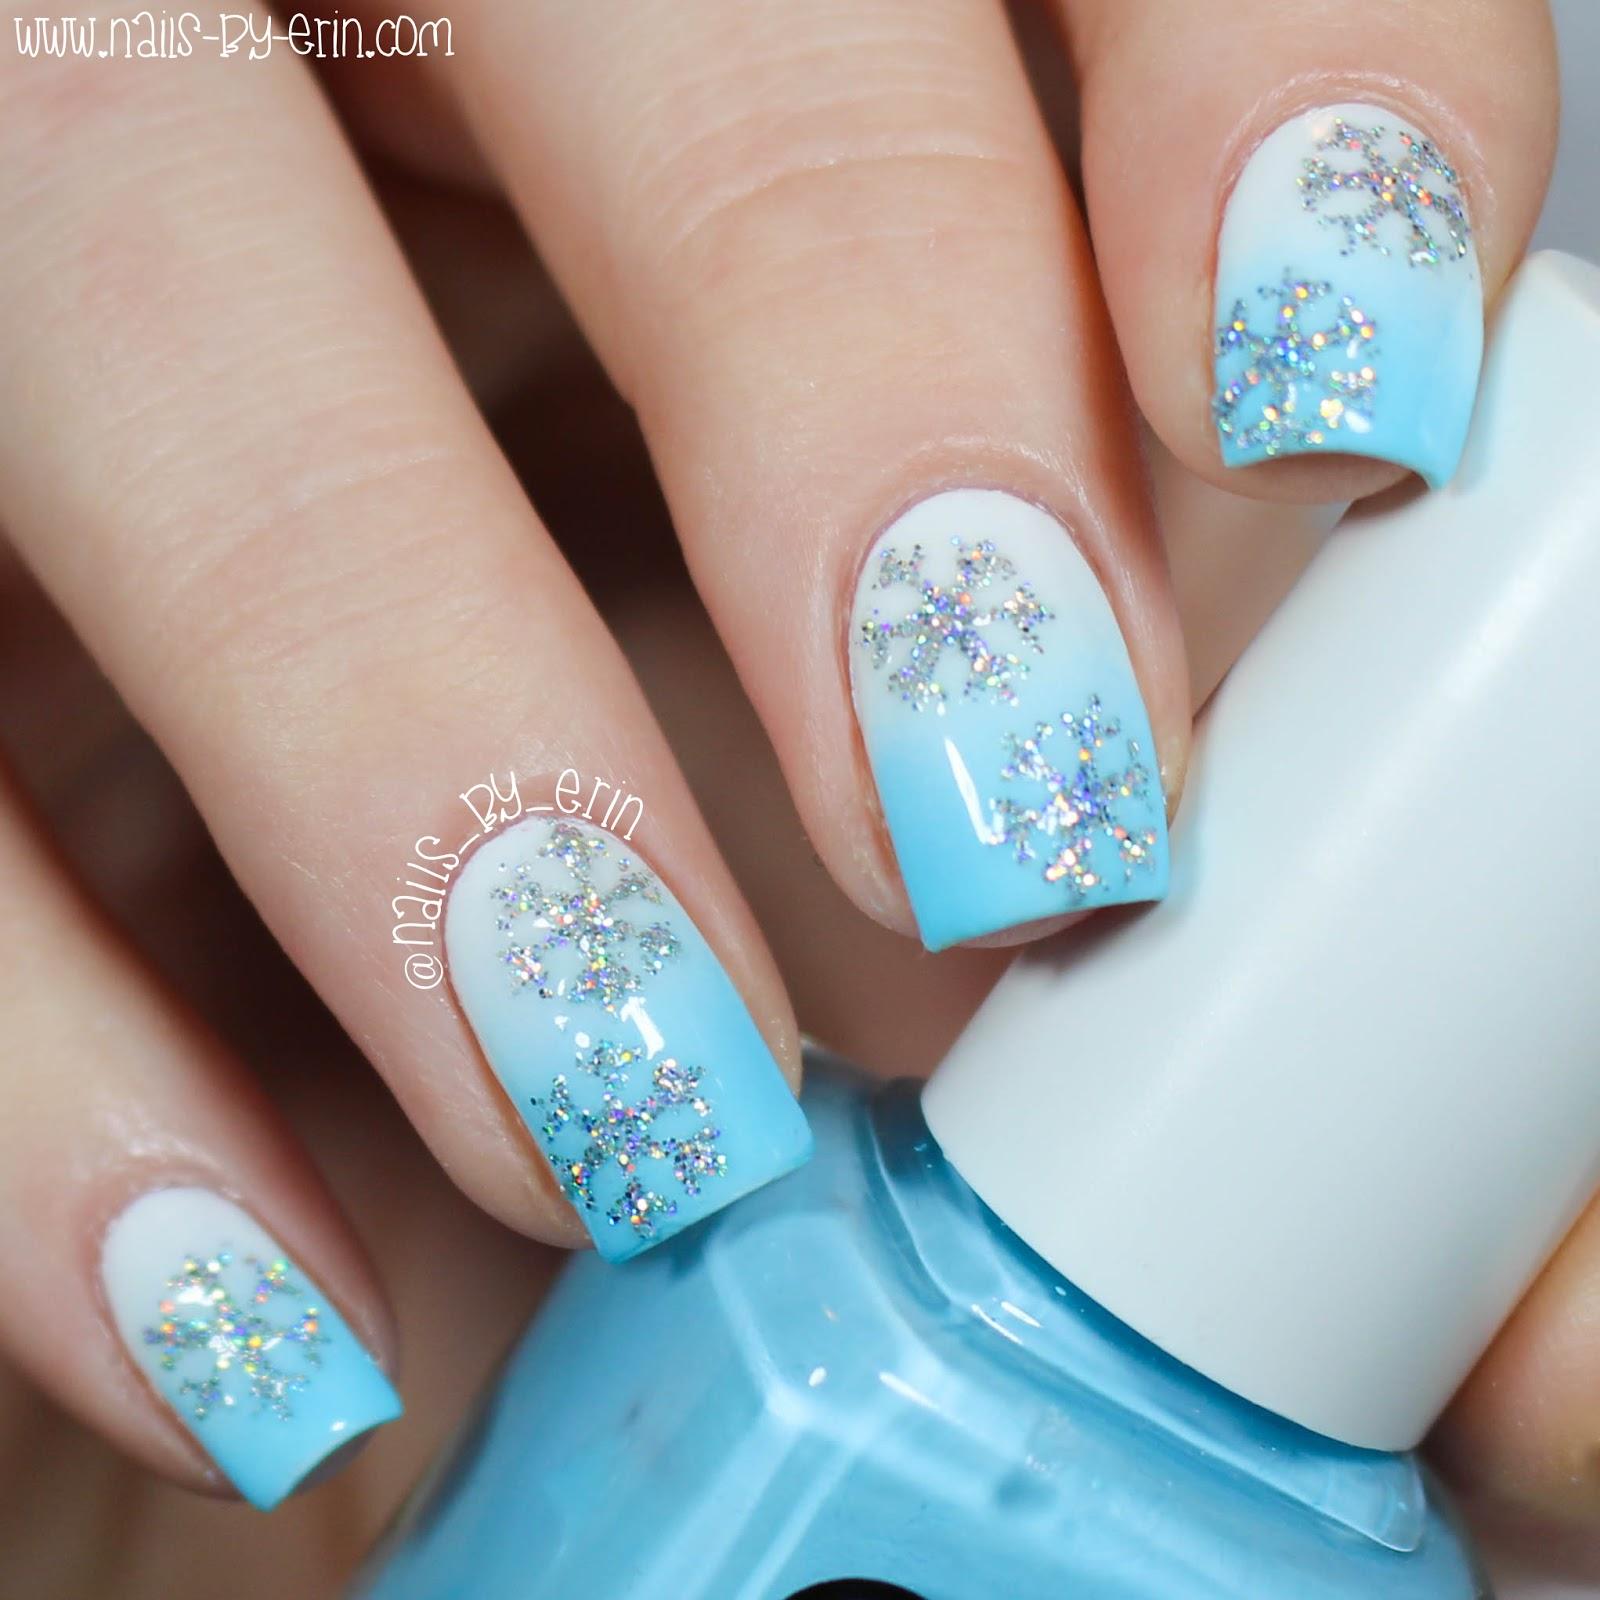 NailsByErin: Glitter Snowflake Nails